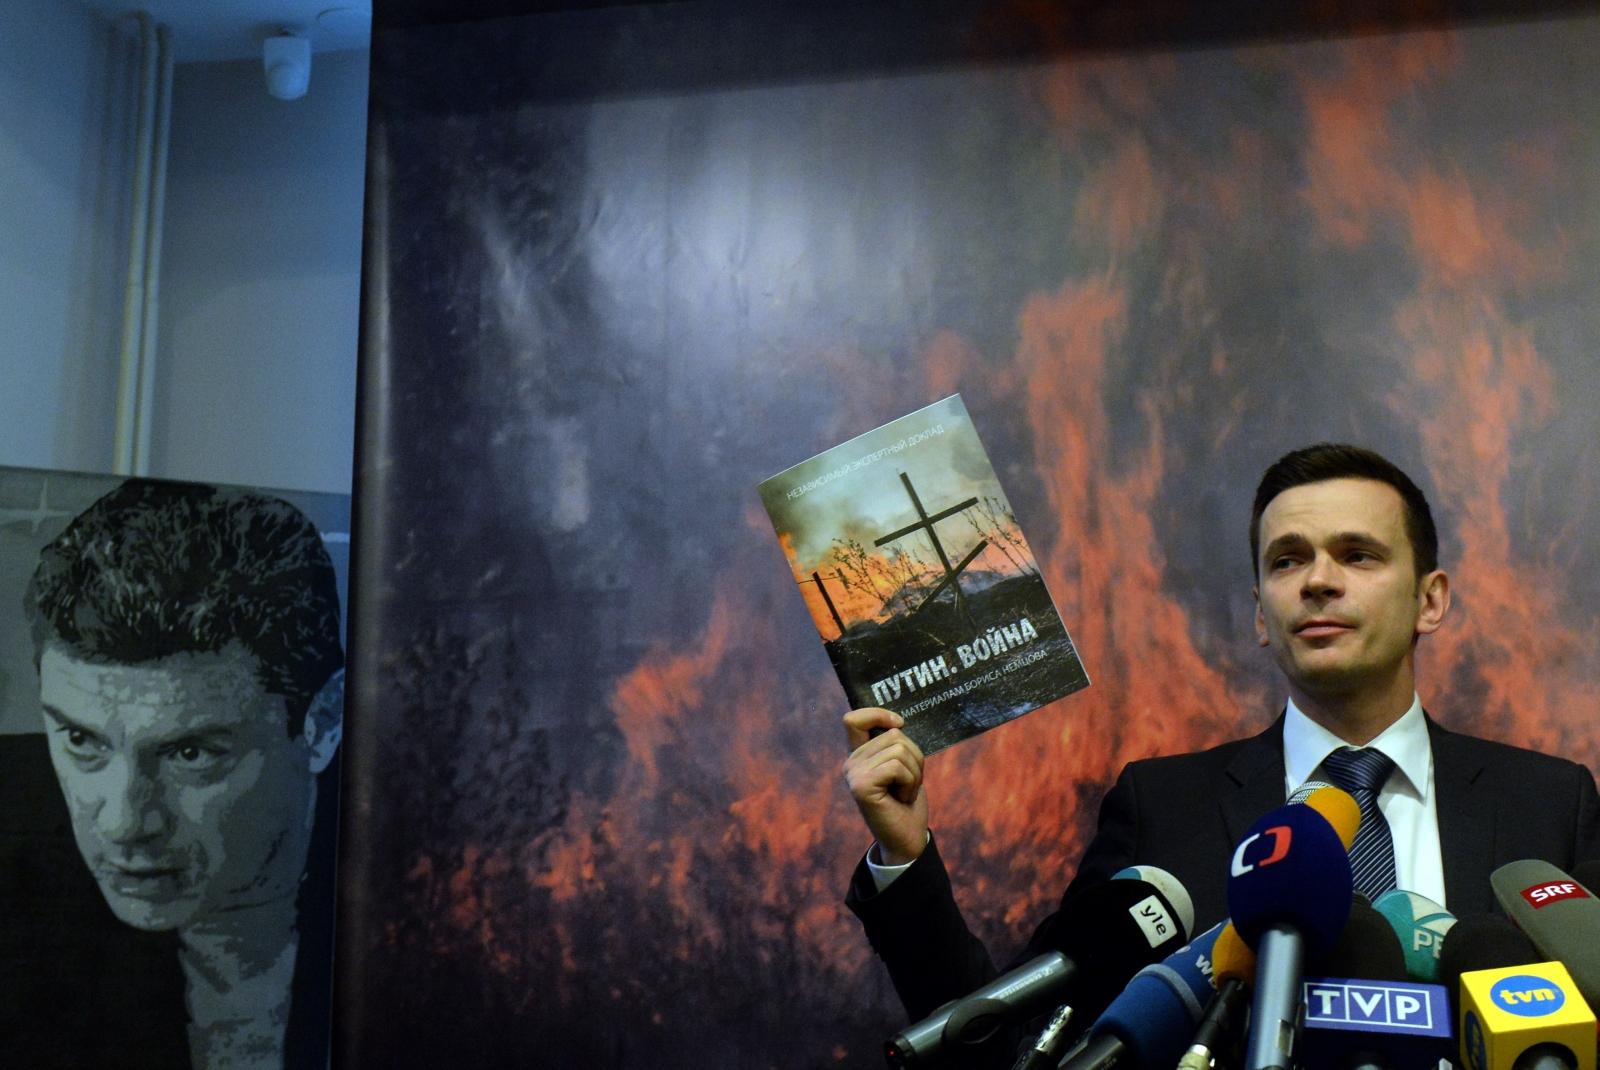 Nemtsov east Ukraine report